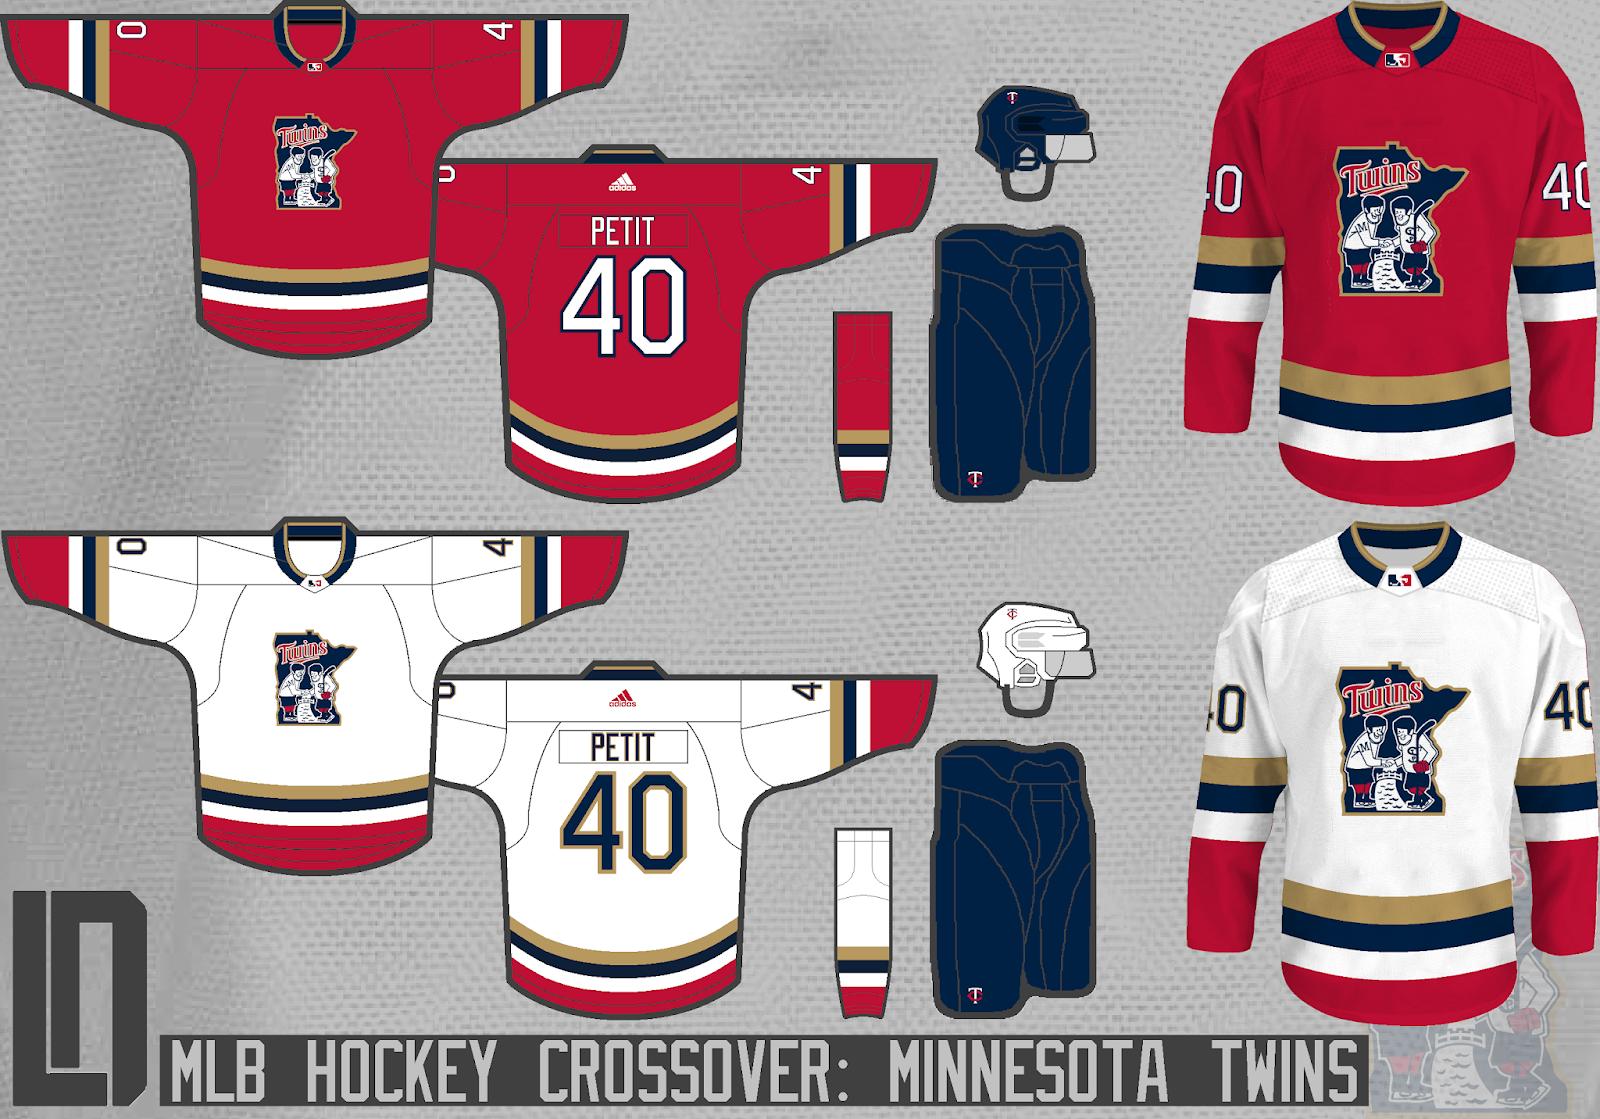 Minnesota+Twins+Concept.png